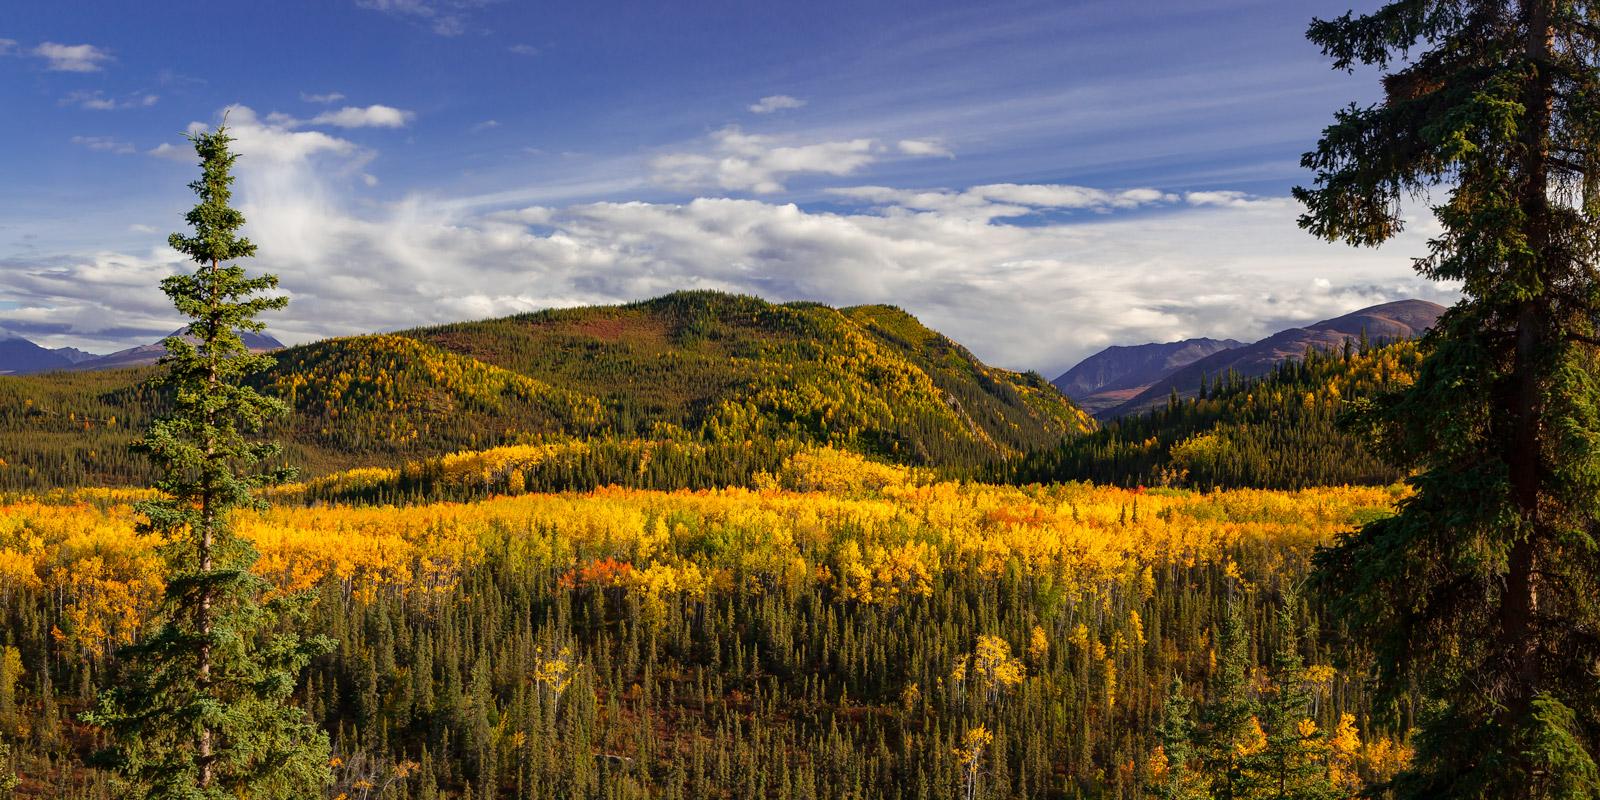 Alaska, Denali, Fall, Color, limited edition, photograph, fine art, landscape, fall color, photo